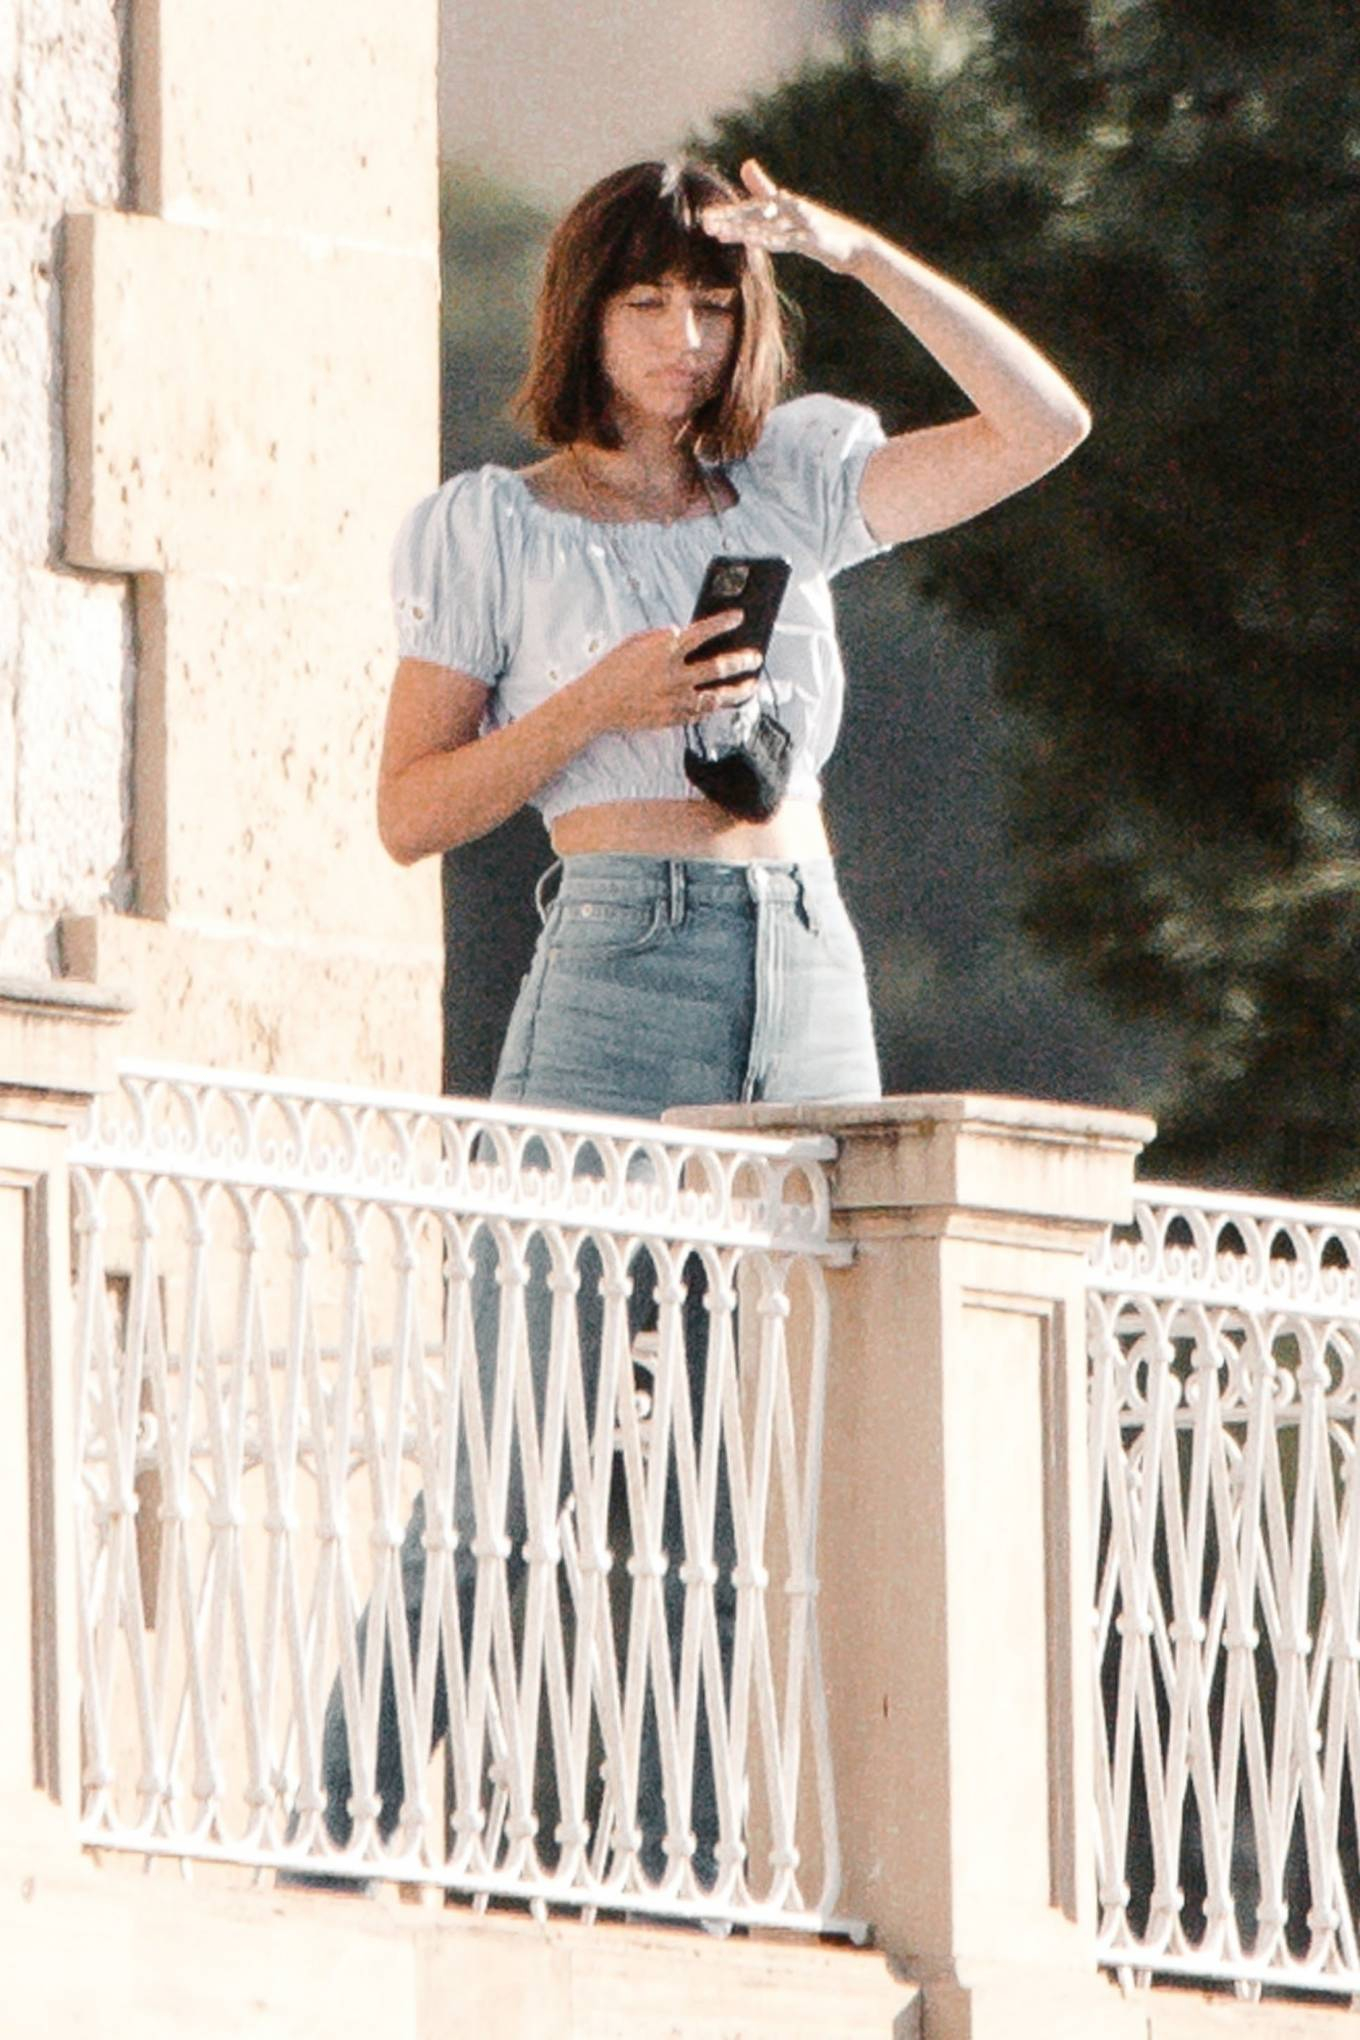 Ana De Armas - Spotted having breakfast with friends at Palma De Mallorca